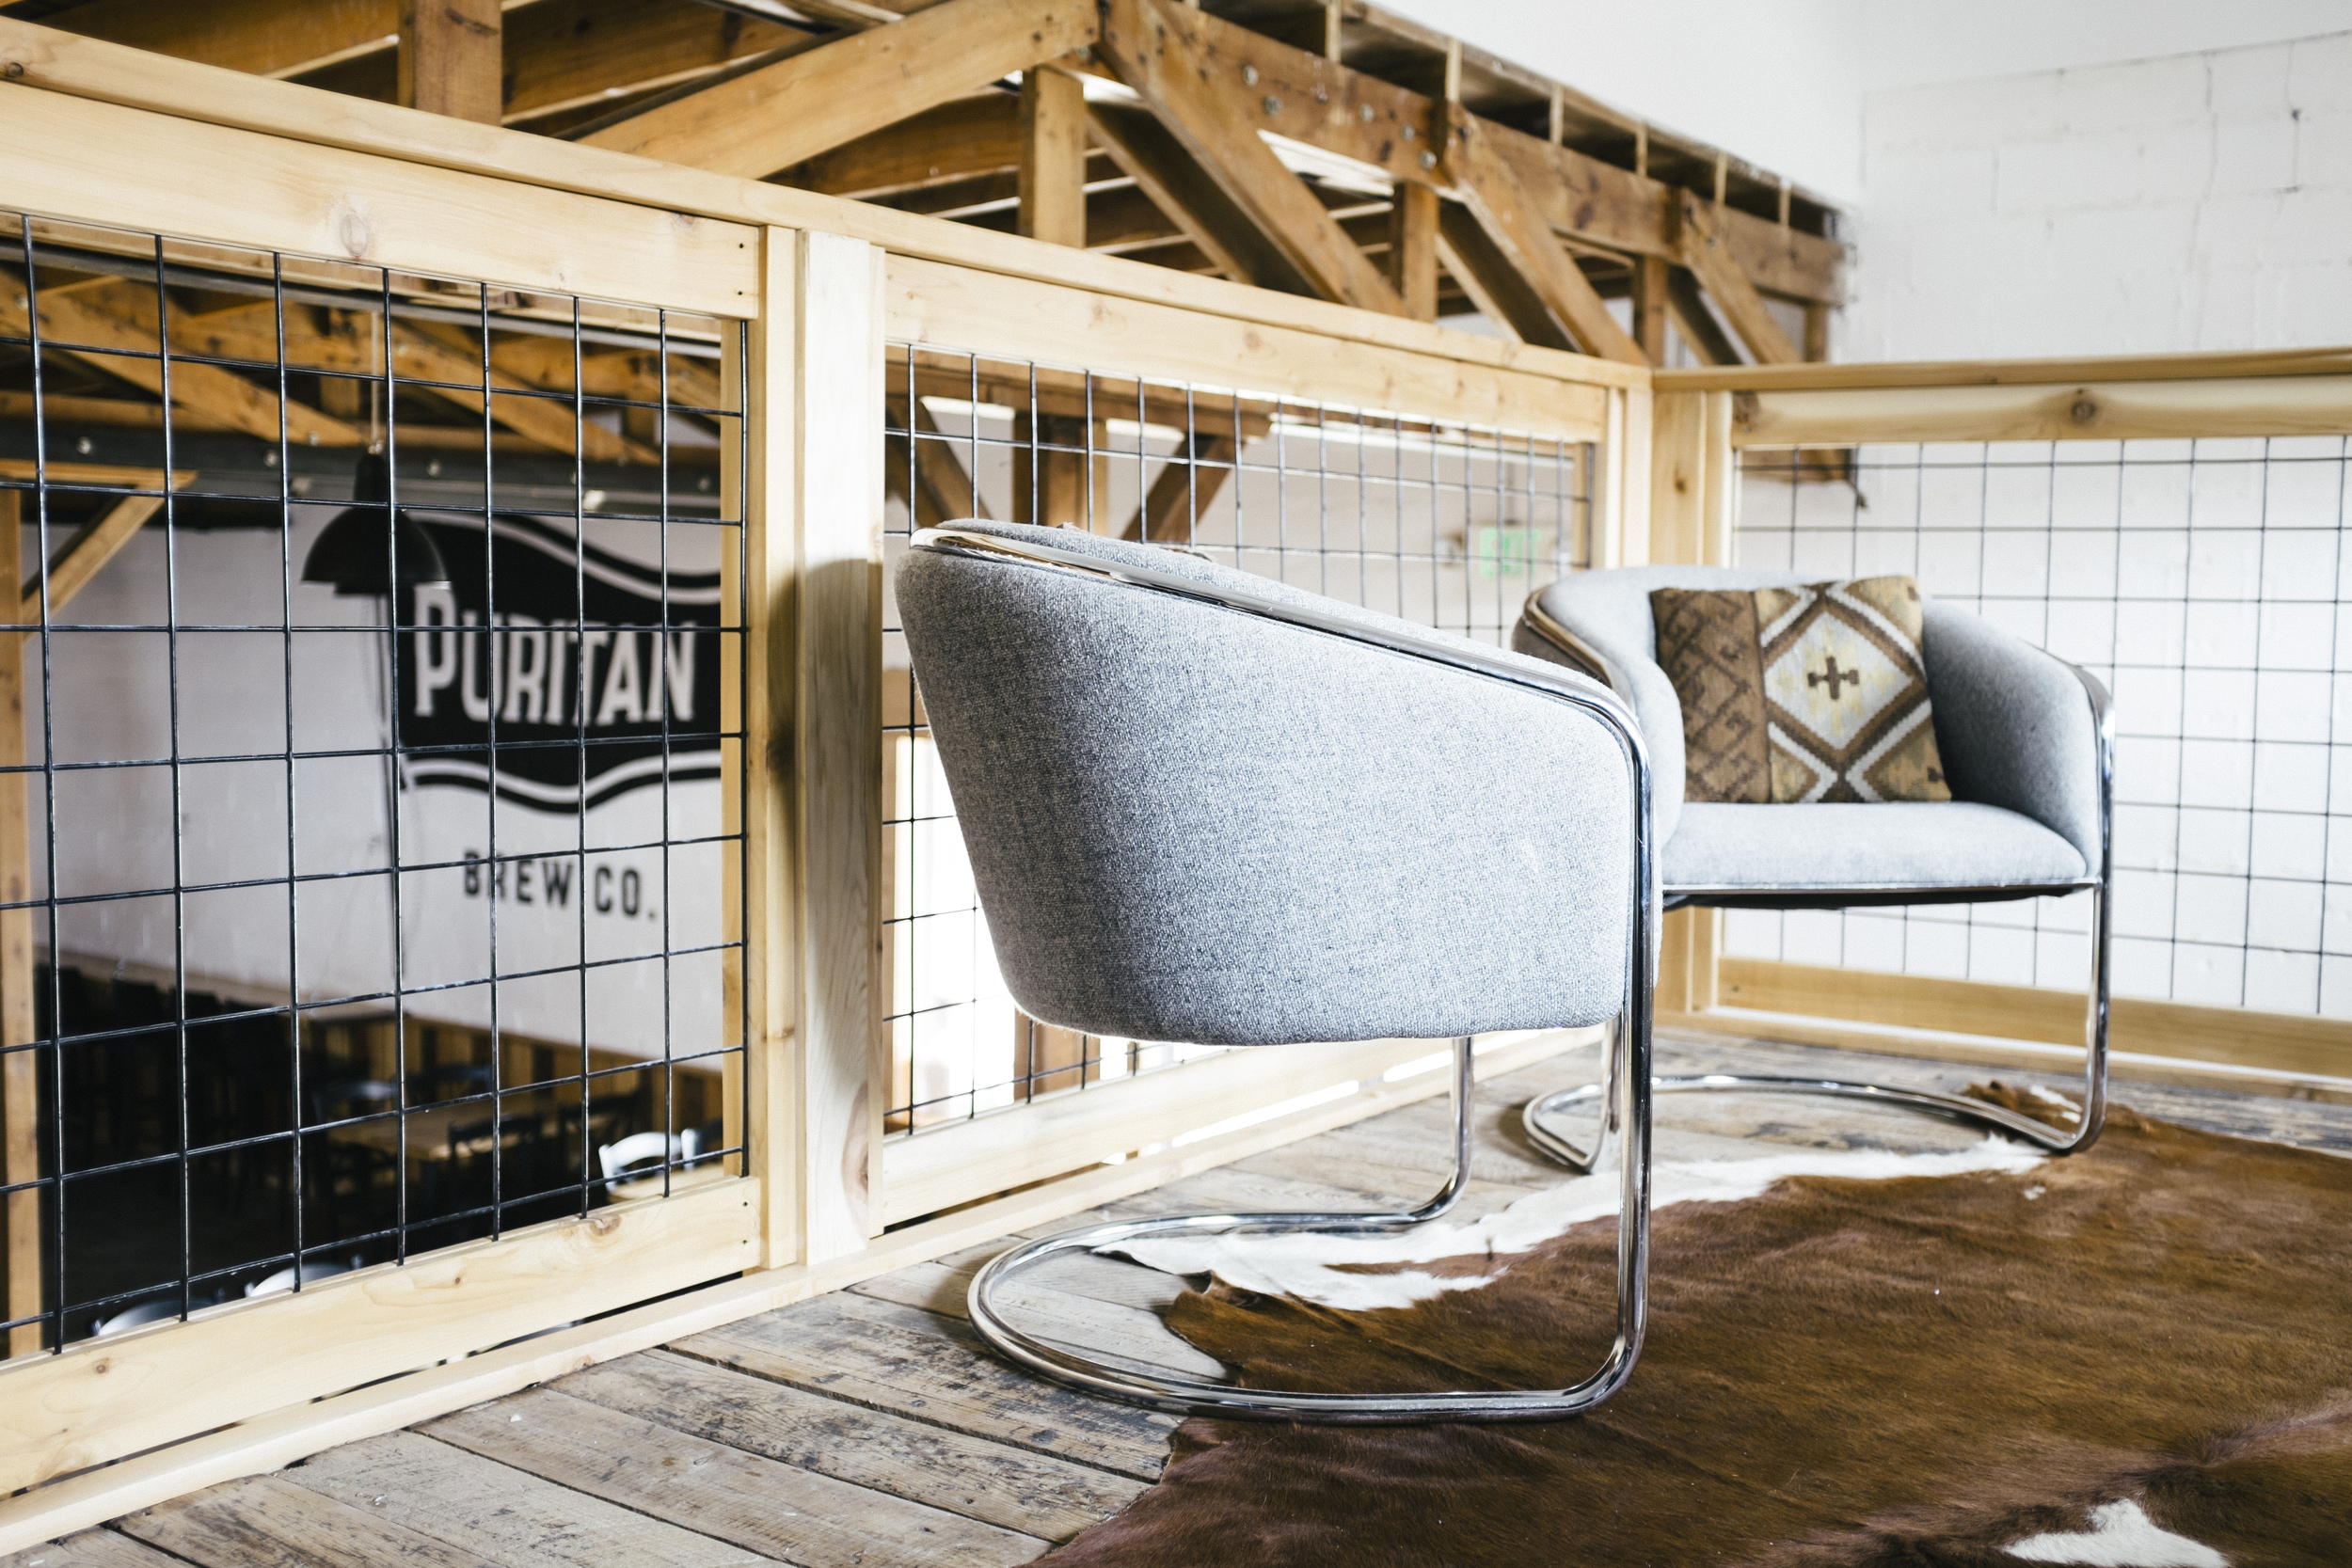 Puritan_Interiors_DSCF2815.jpg